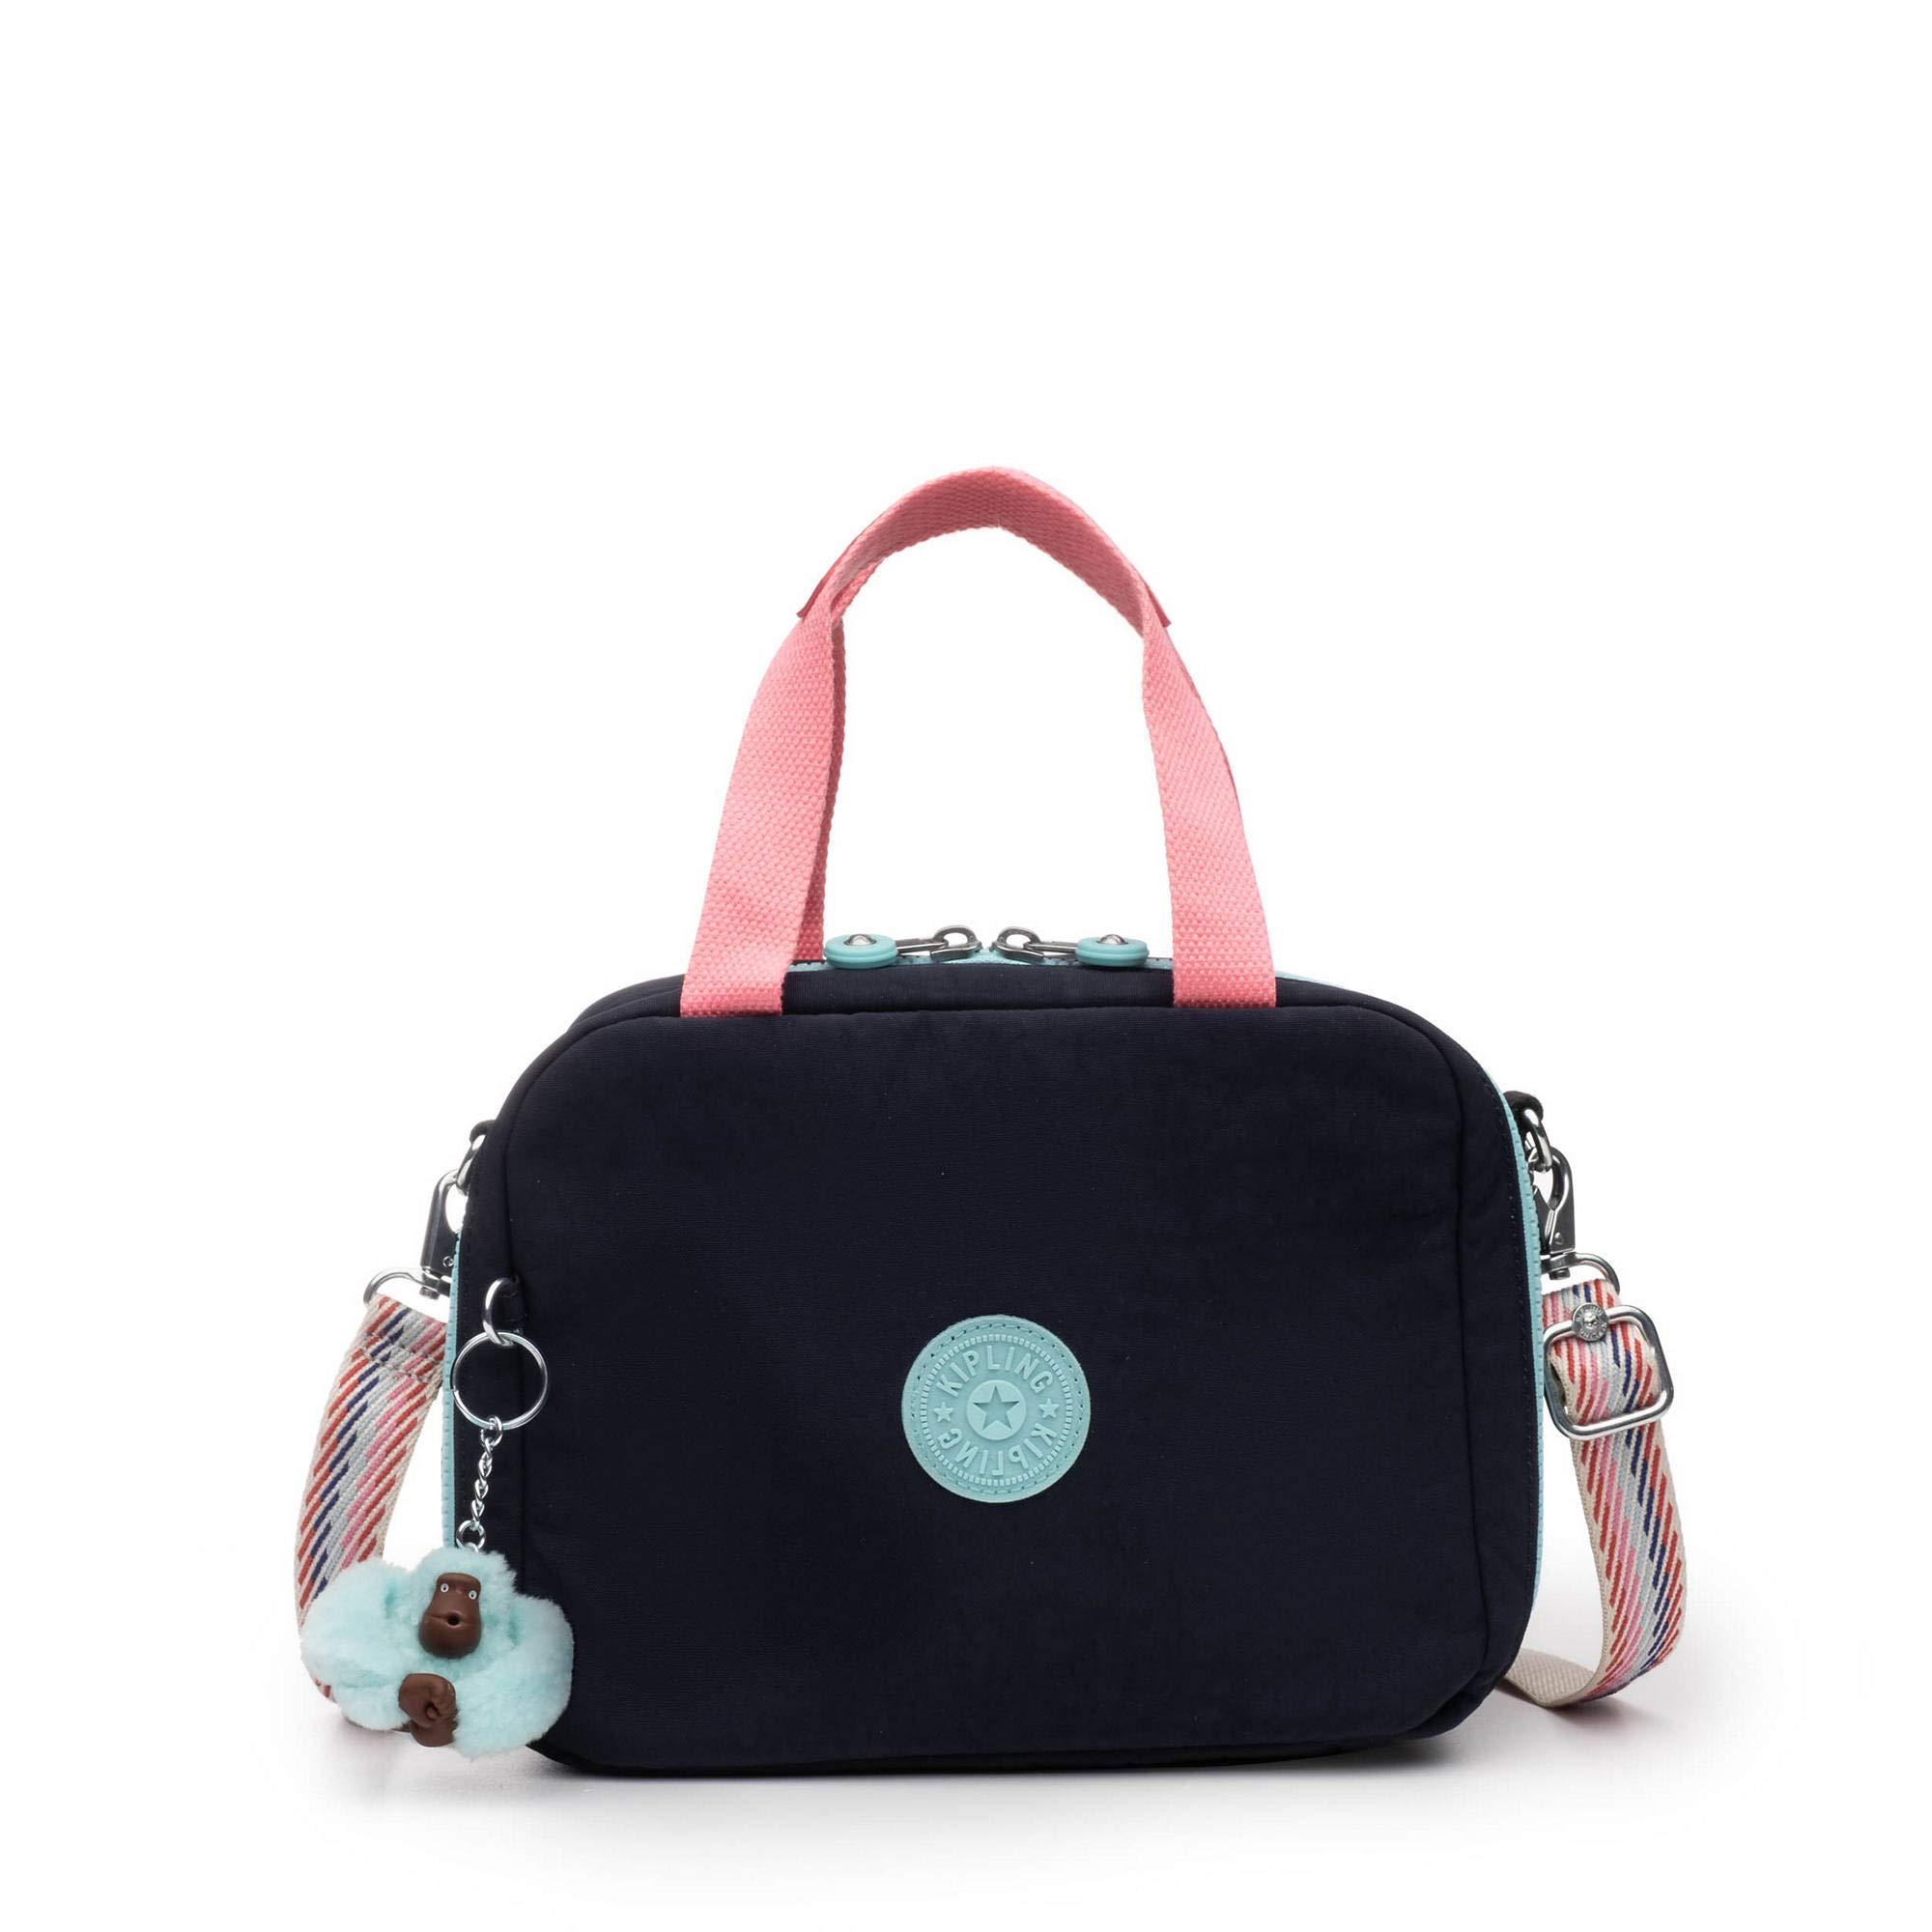 Kipling Miyo Lunch Bag True Blue 4